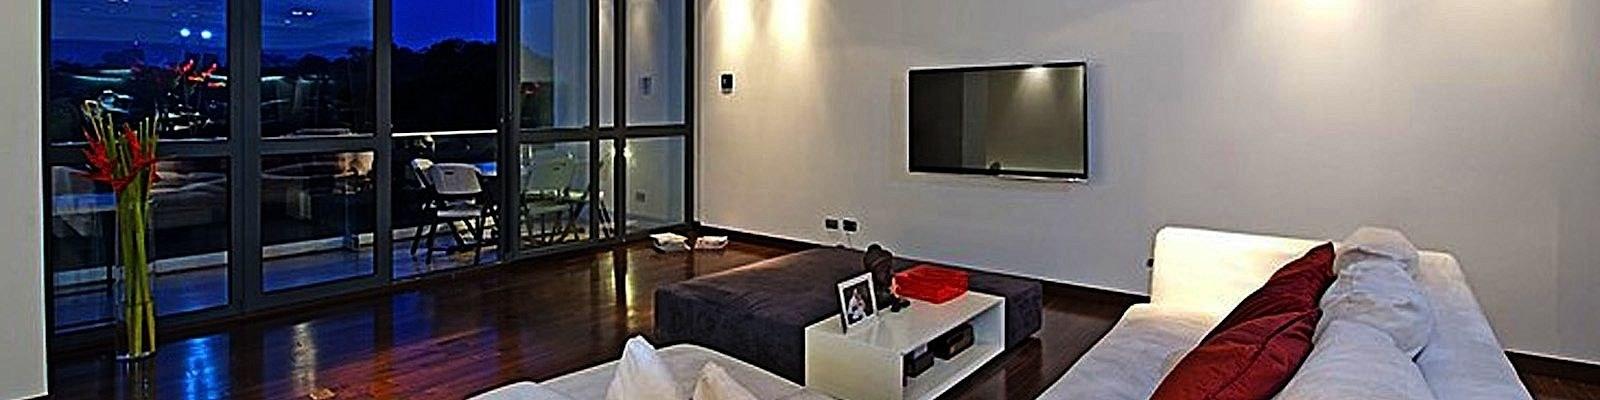 Mafi Real Estate Condos & Apartments